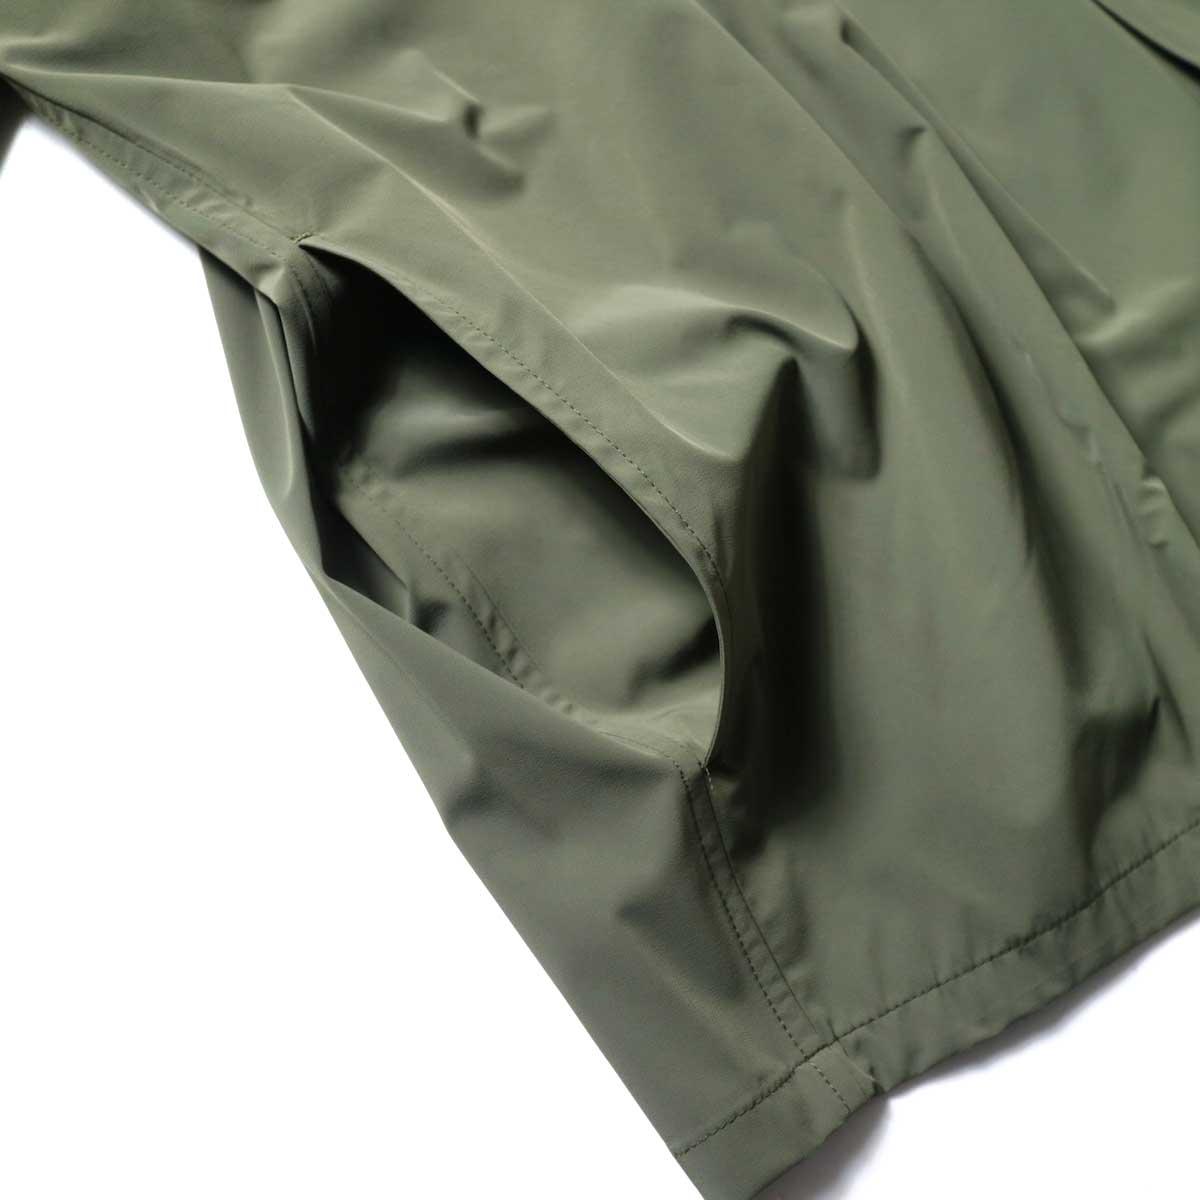 N.HOOLYWOOD / 2211-SH25-006 peg Collarless Shirt (Khaki)ポケット